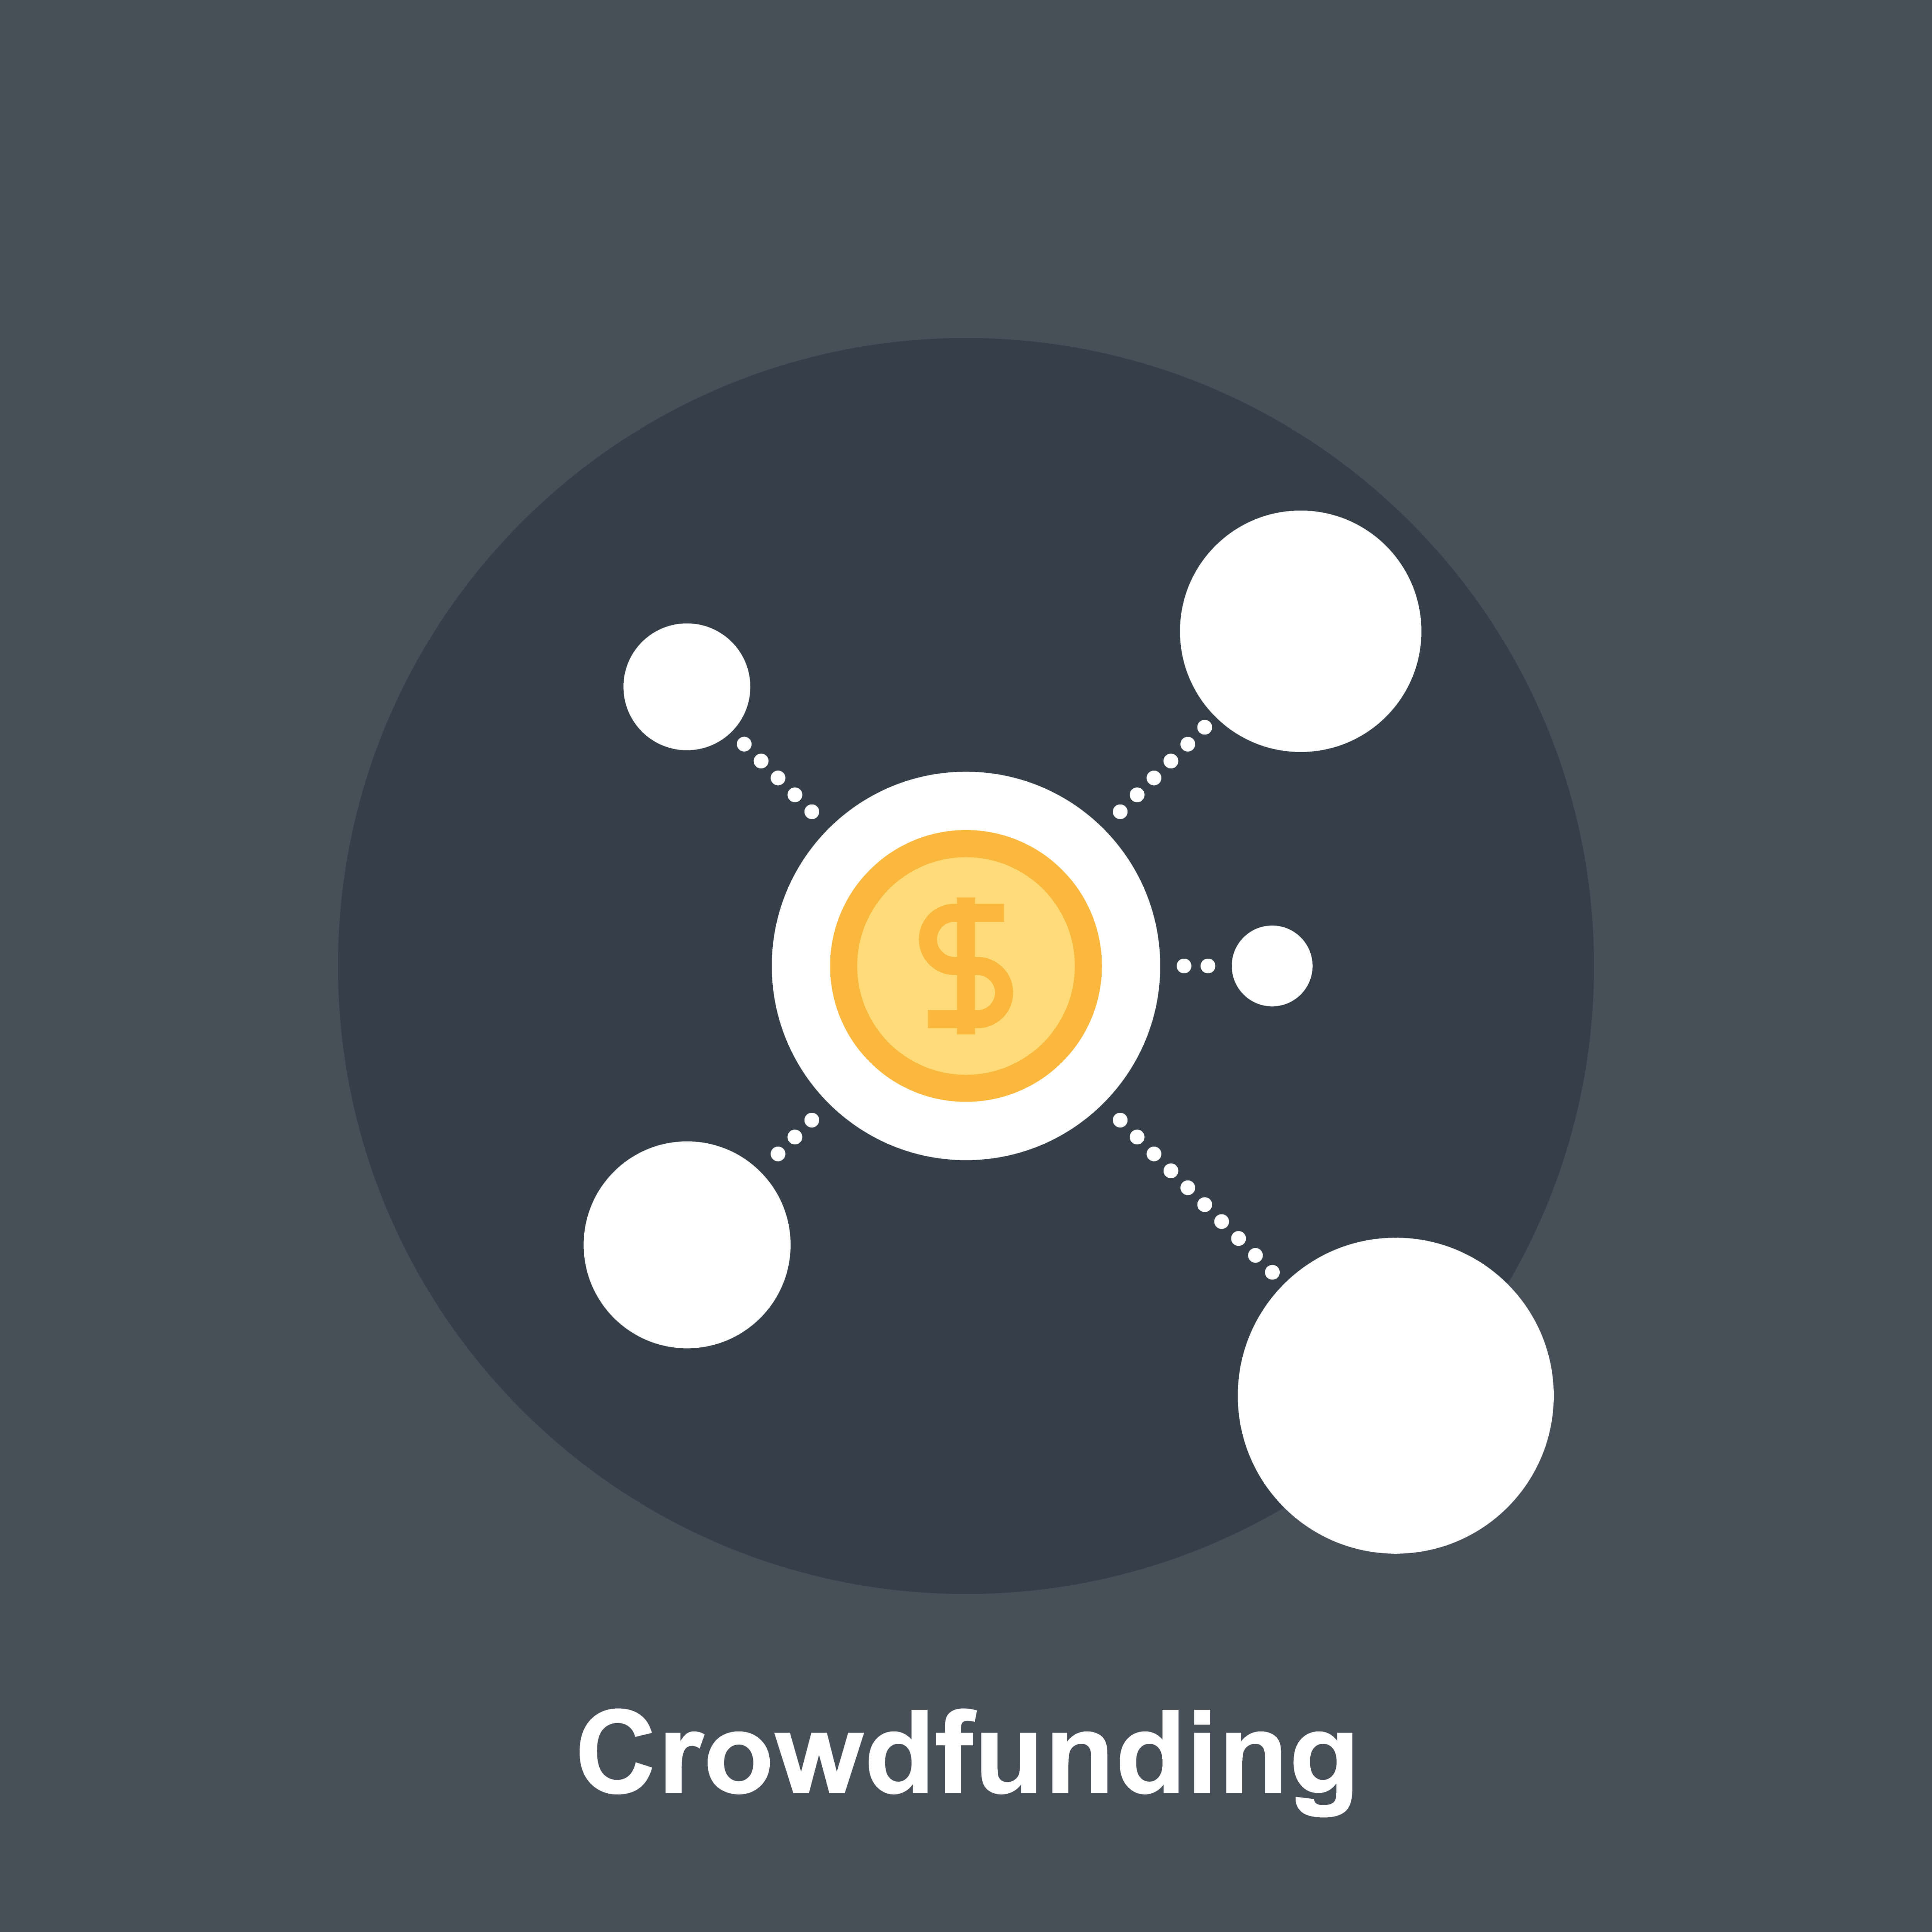 Crowdfunding fundamentals